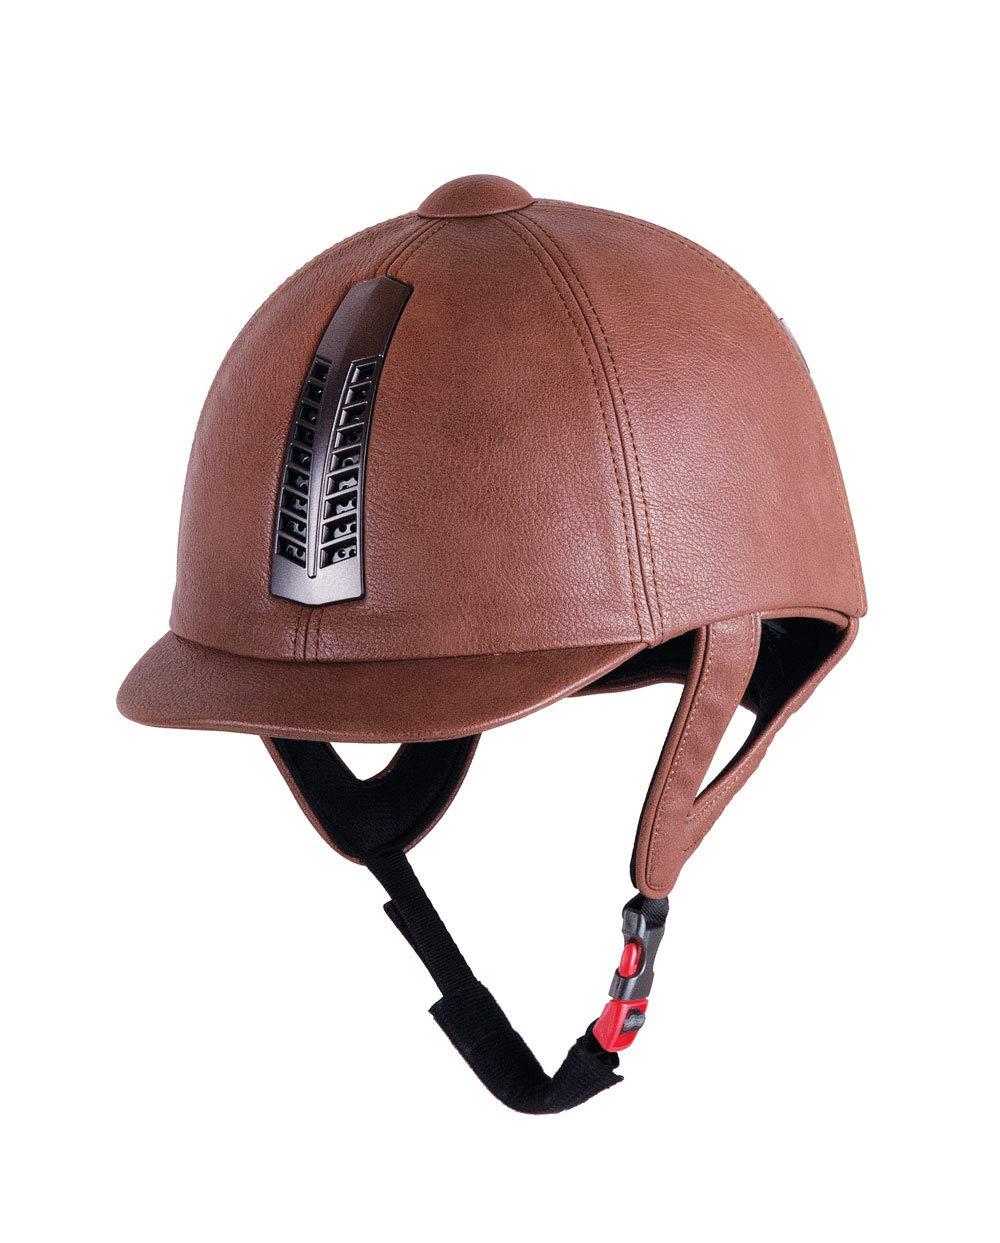 Rhinegold Pro Riding Hat